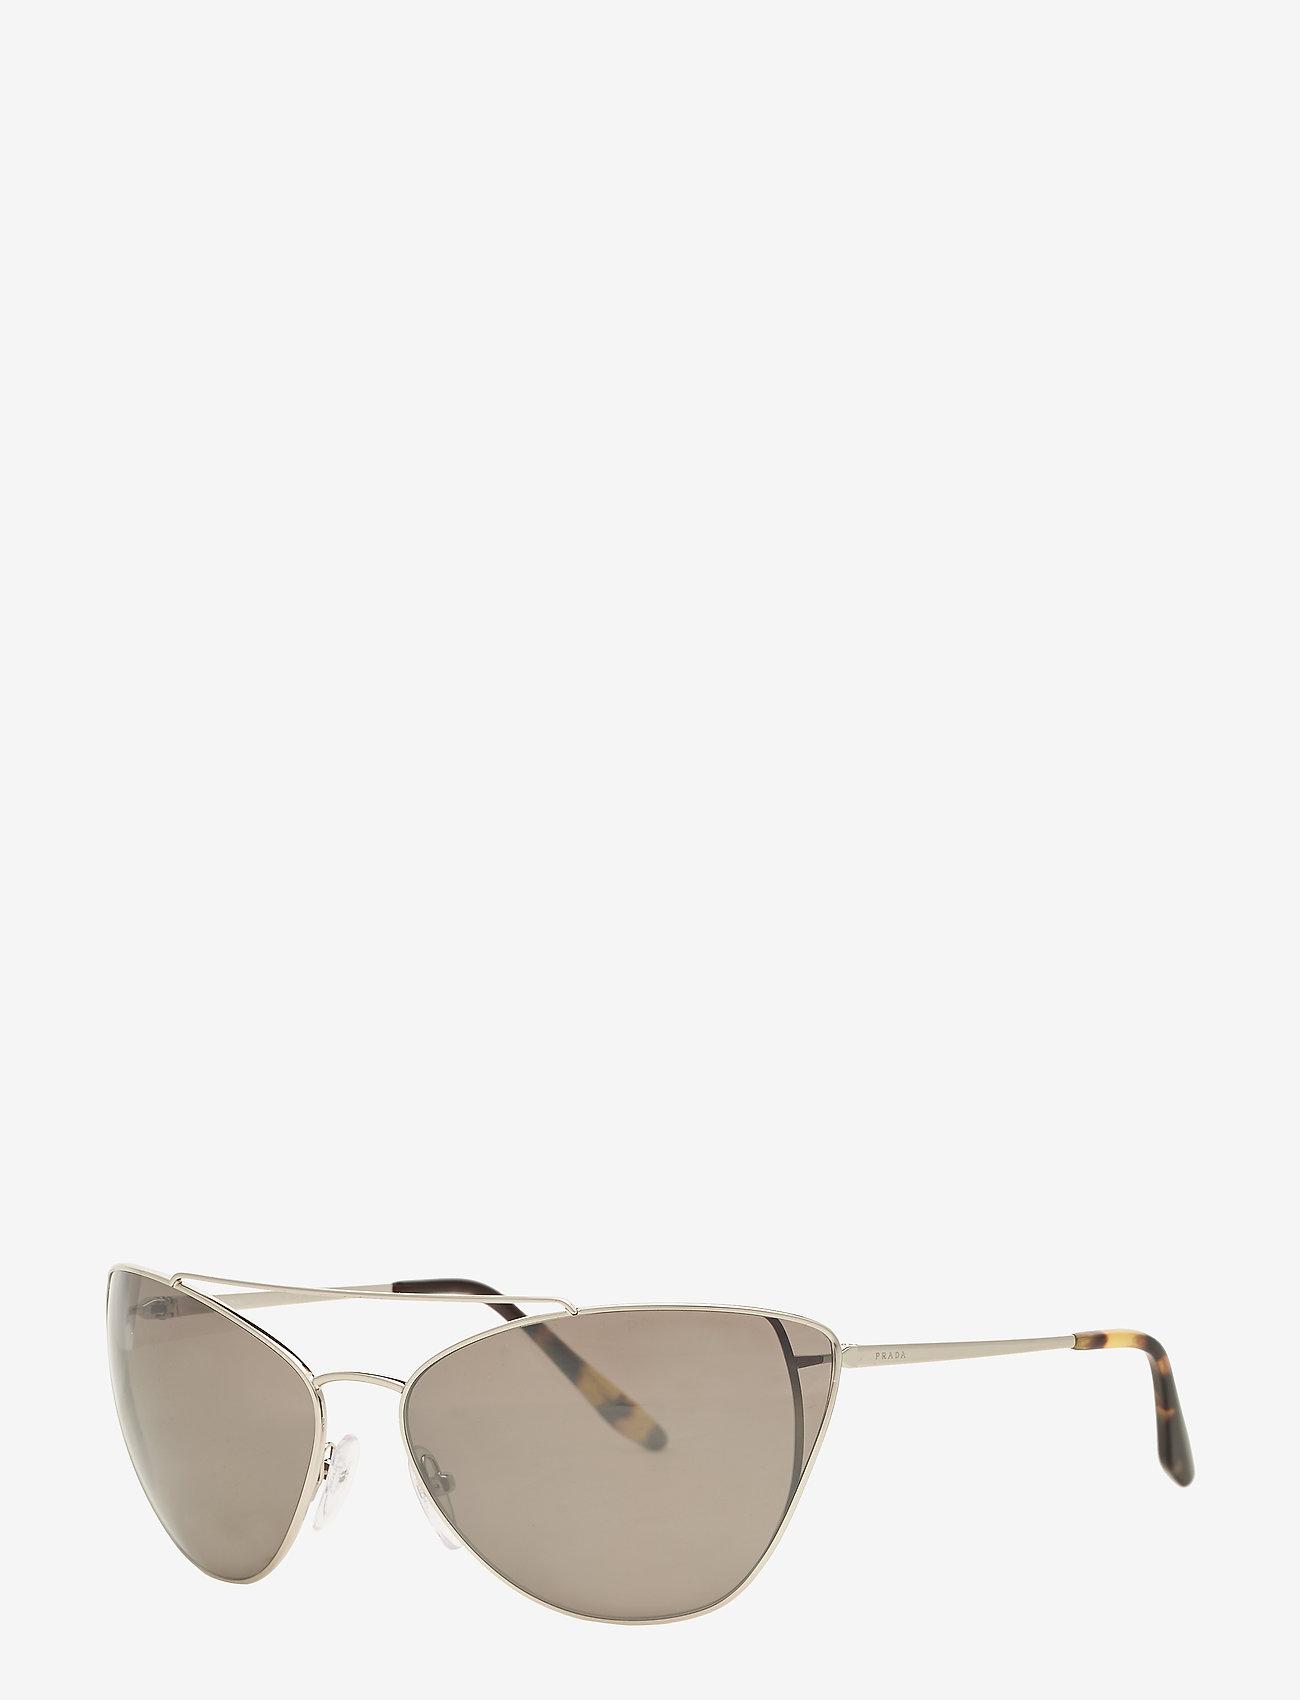 Prada Sunglasses - Prada Sunglasses - cat-eye - silver - 1